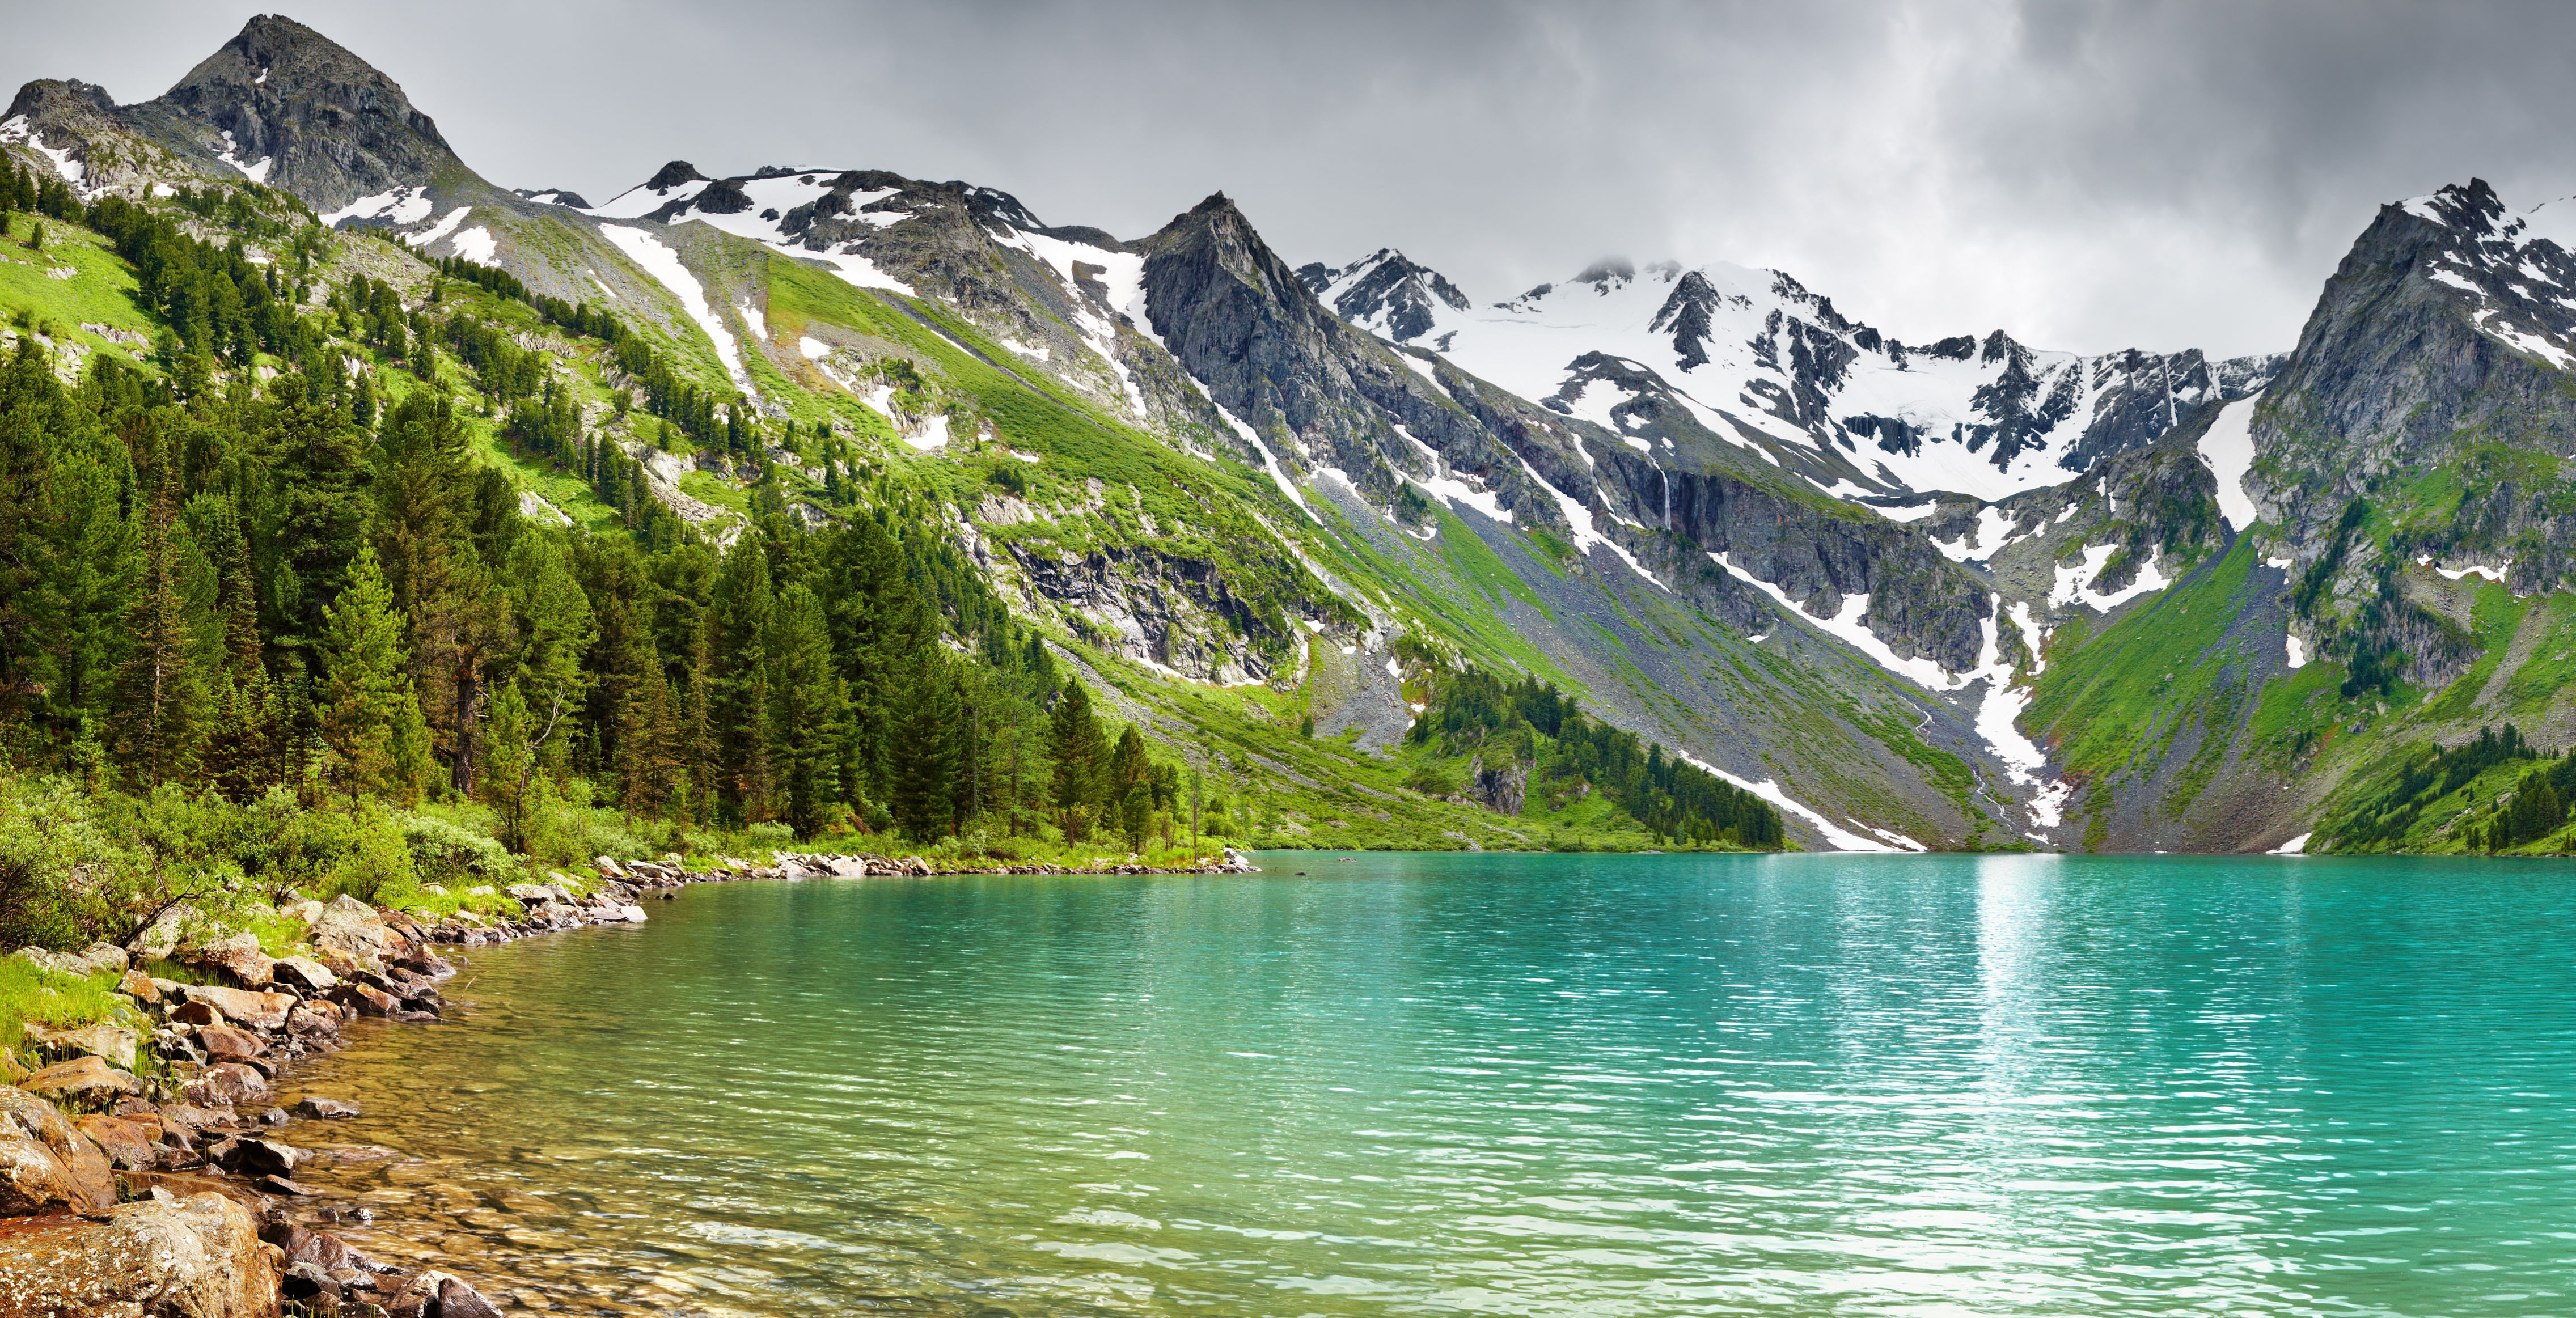 Mountain 4k Ultra Hd Wallpaper Background Image 4543x2325 Id 572569 Wallpaper Abyss